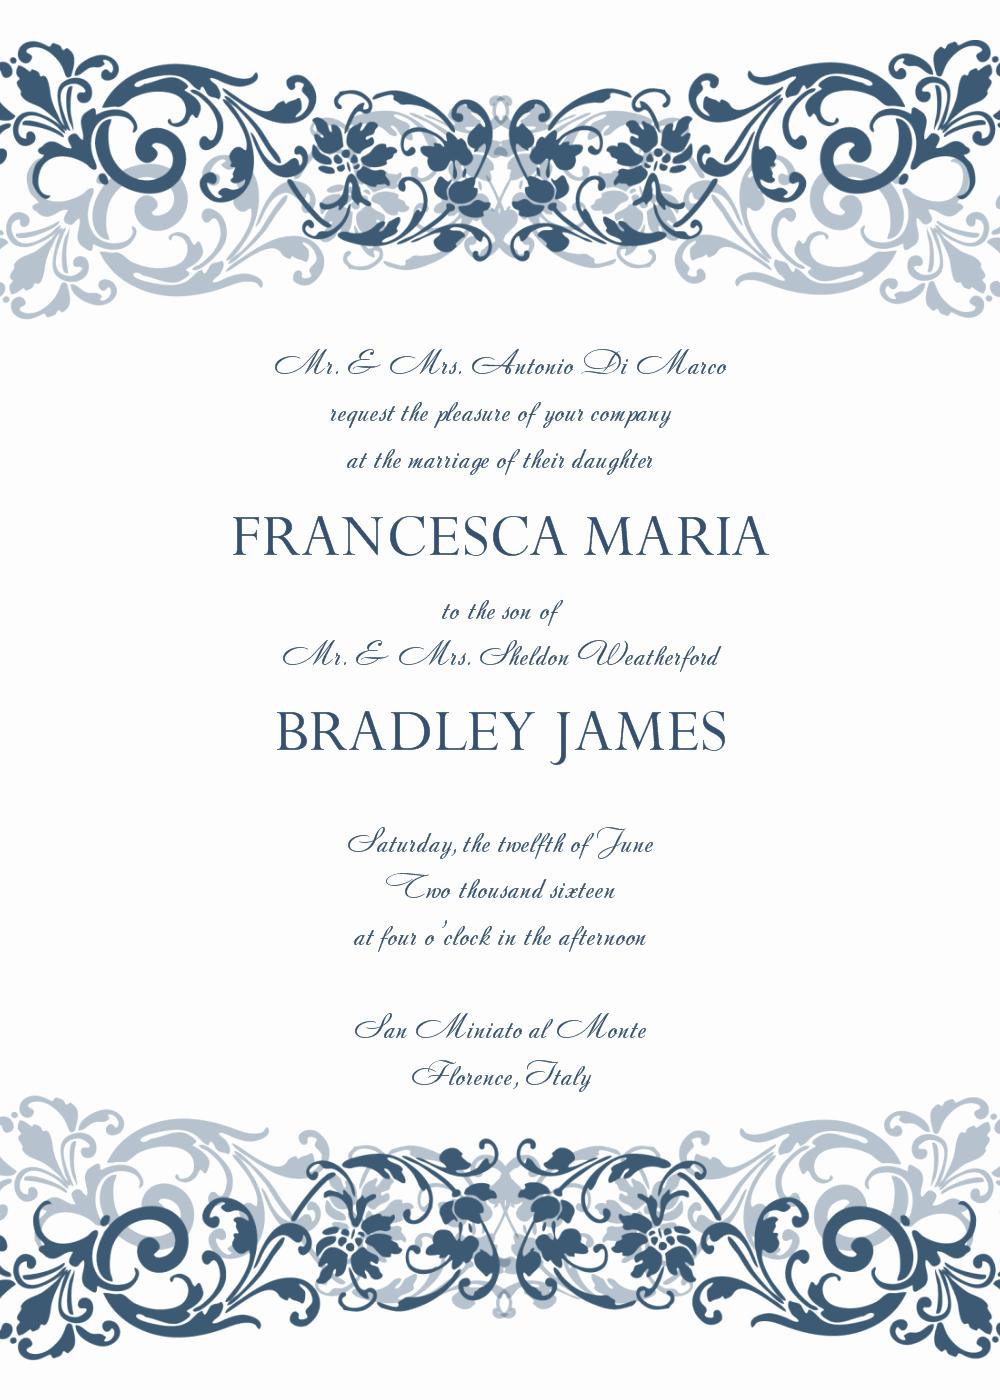 Wedding Invitations Templates Microsoft Word Beautiful 8 Free Wedding Invitation Templates Excel Pdf formats